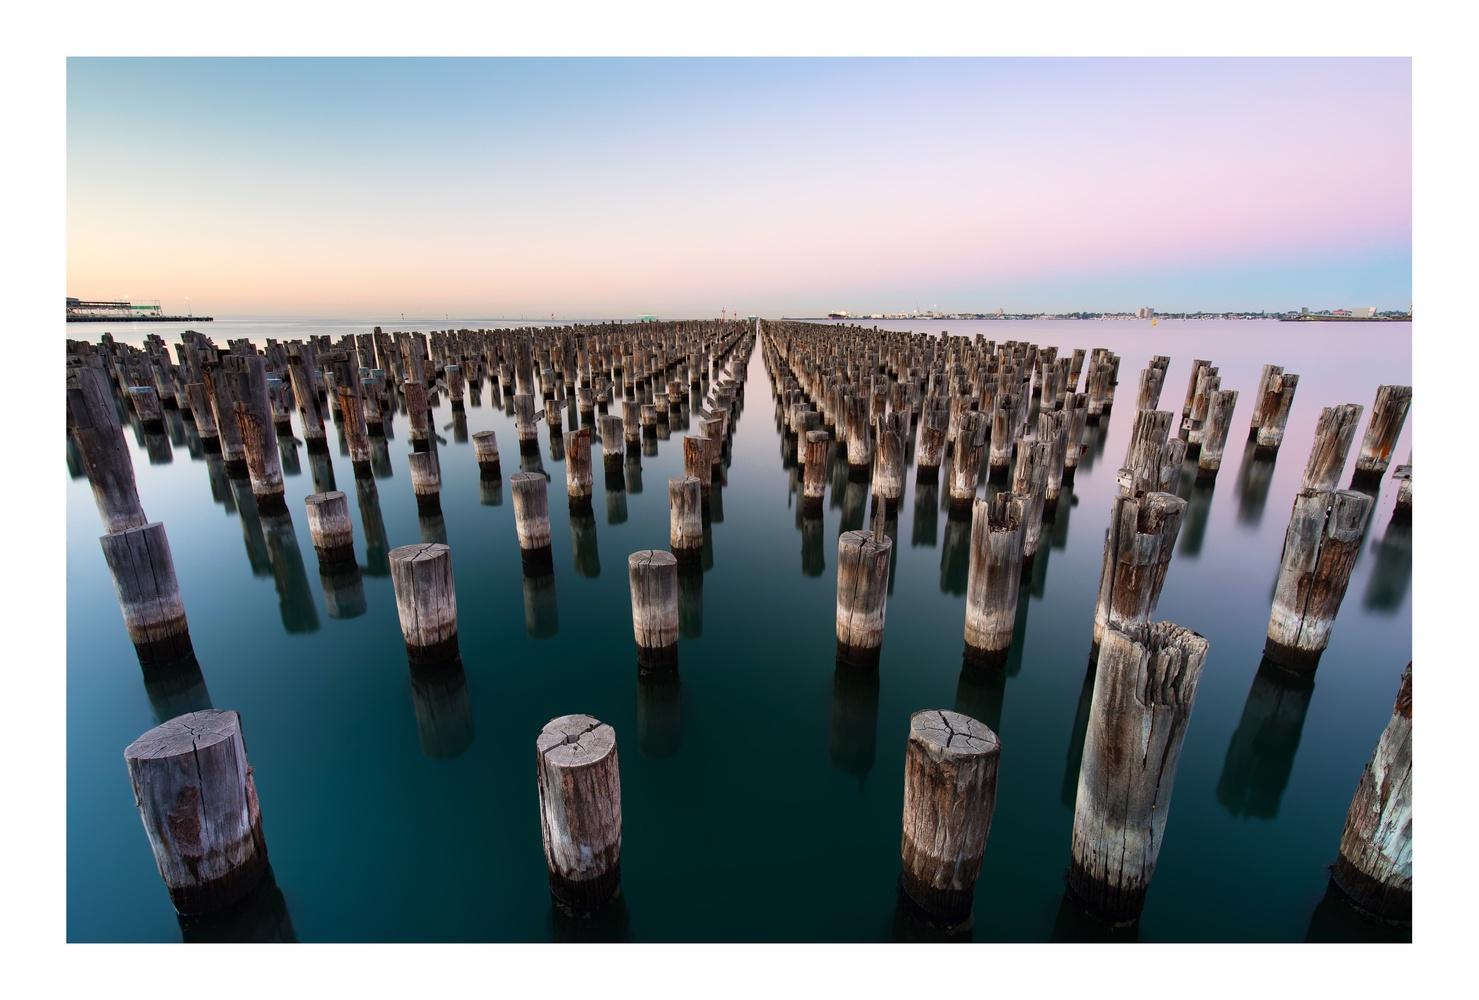 Princes Pier by Peter Virag